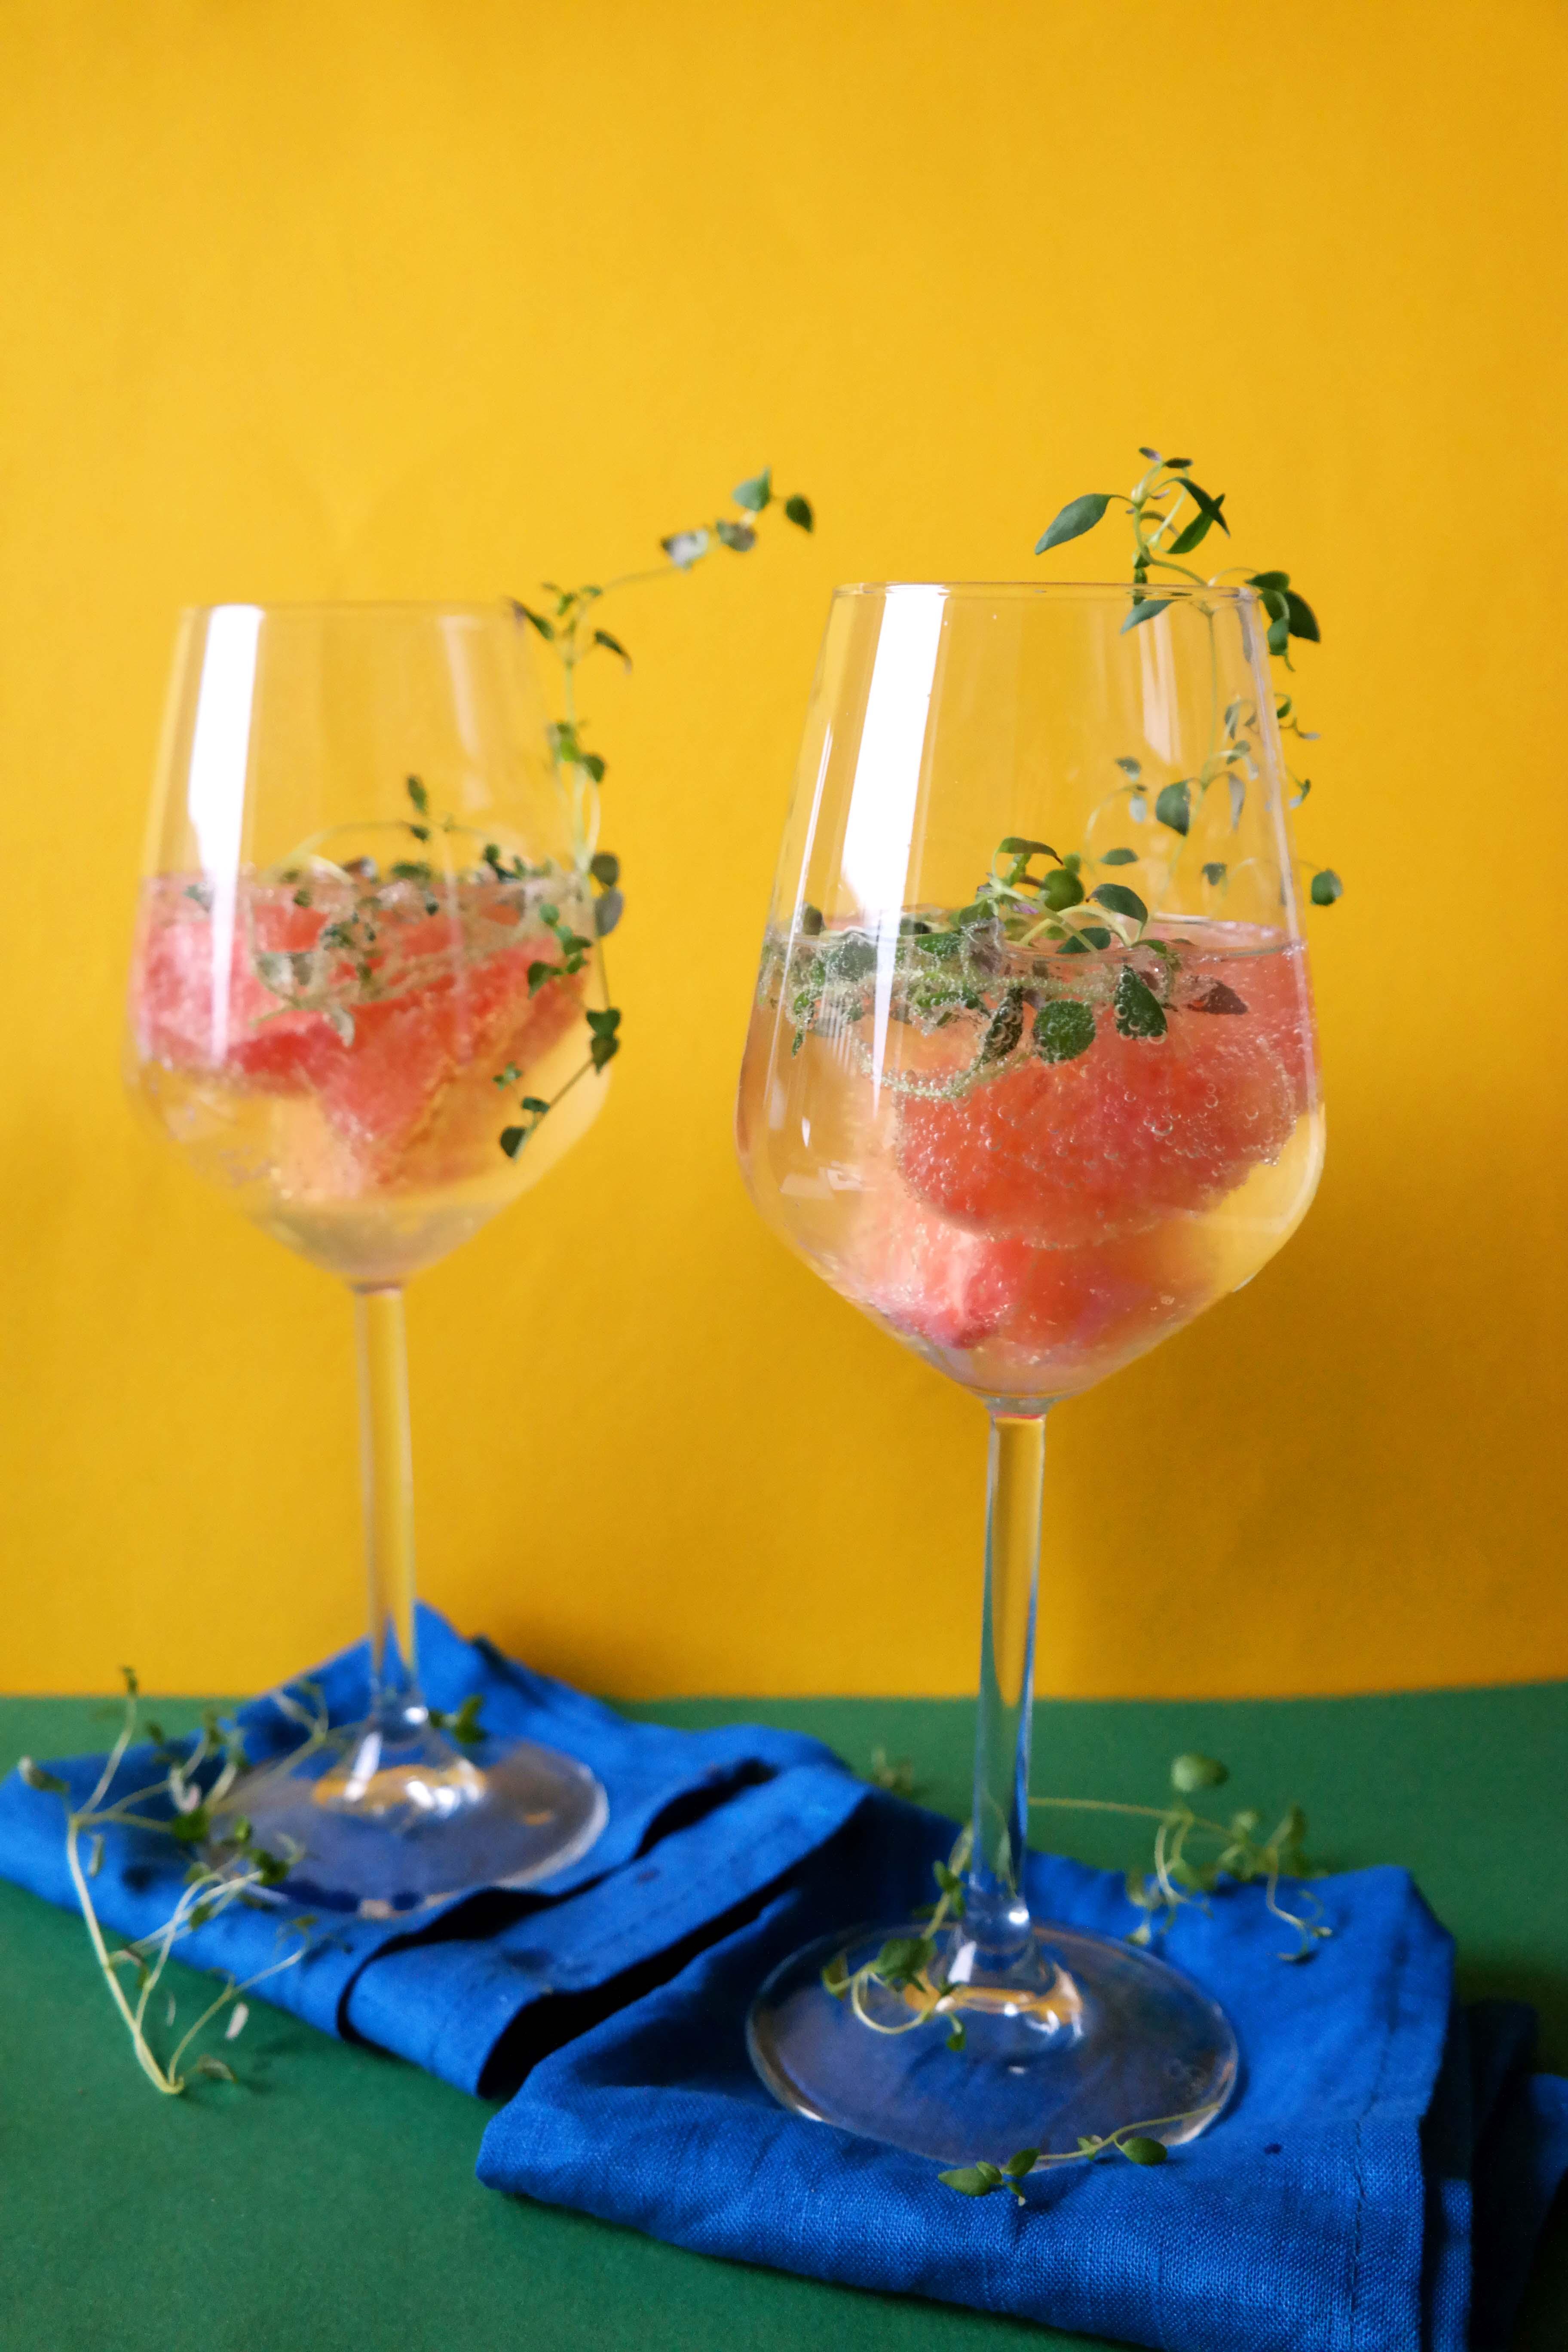 Grapefruit-Thymian Spritzer